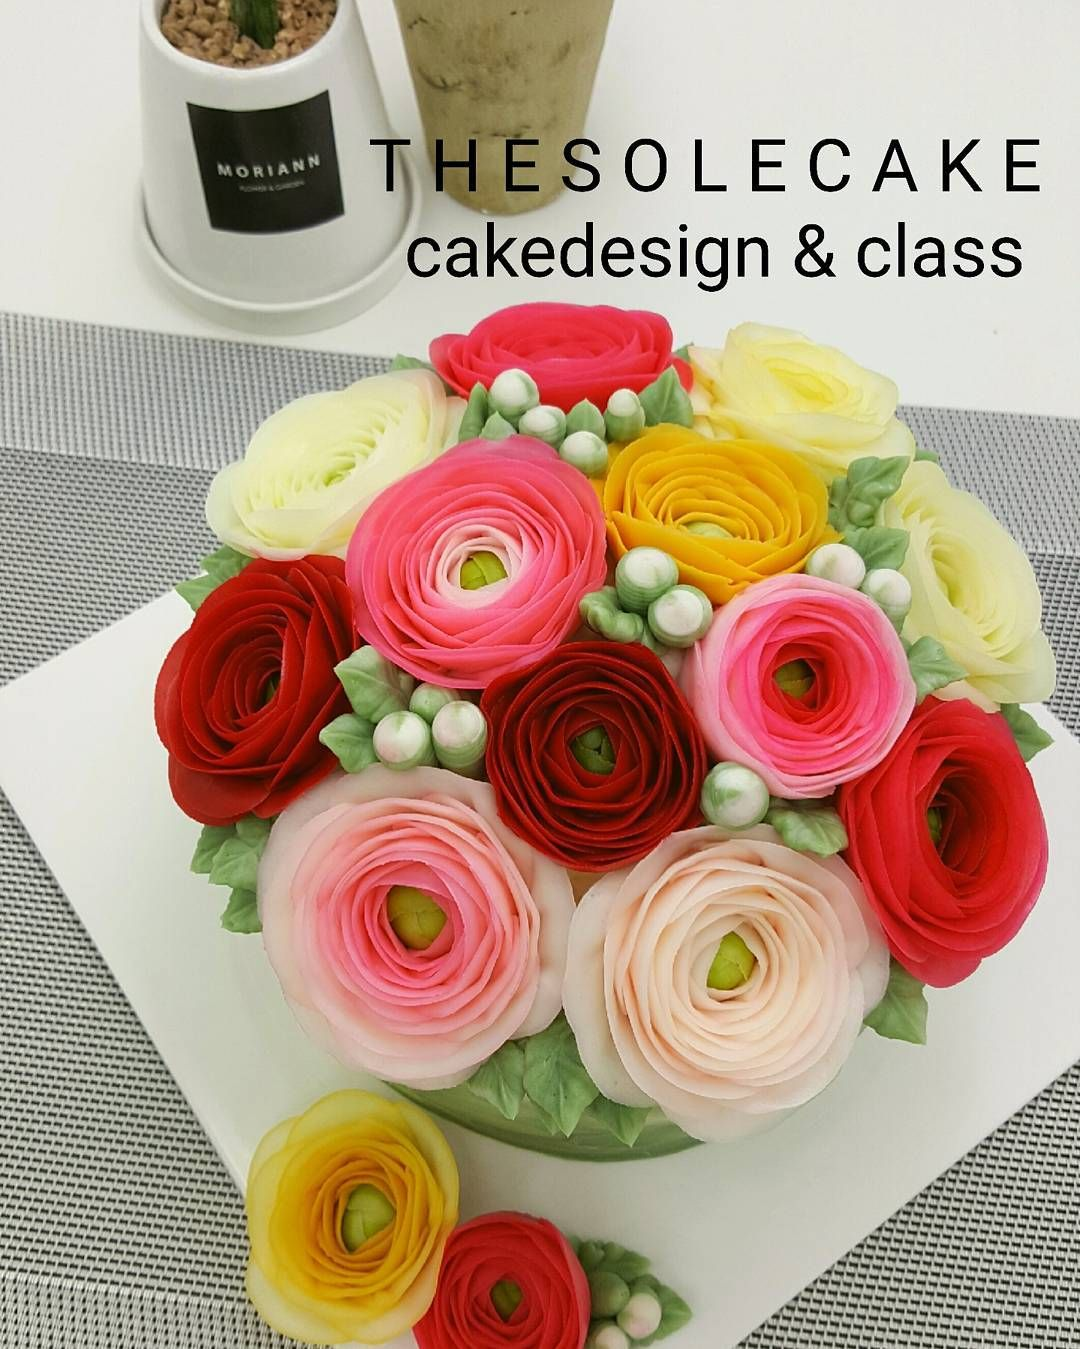 ♡thesole's blossom♡ Ranunculus 쨍~한 컬러의 하노이들..- Made by inyeong #baking #buttercreamcake #cake #cakedesign #flowercake #cakedecorating#dessert#koreanbuttercreamflowers#버터크림플라워케이크 #decoration#버터크림케이크#anniversary #colorfood #flowers #fleur #class #wedding #클래스#선물#기념일#하노이 #플라워케이크 #삼선교 #더쏠케이크